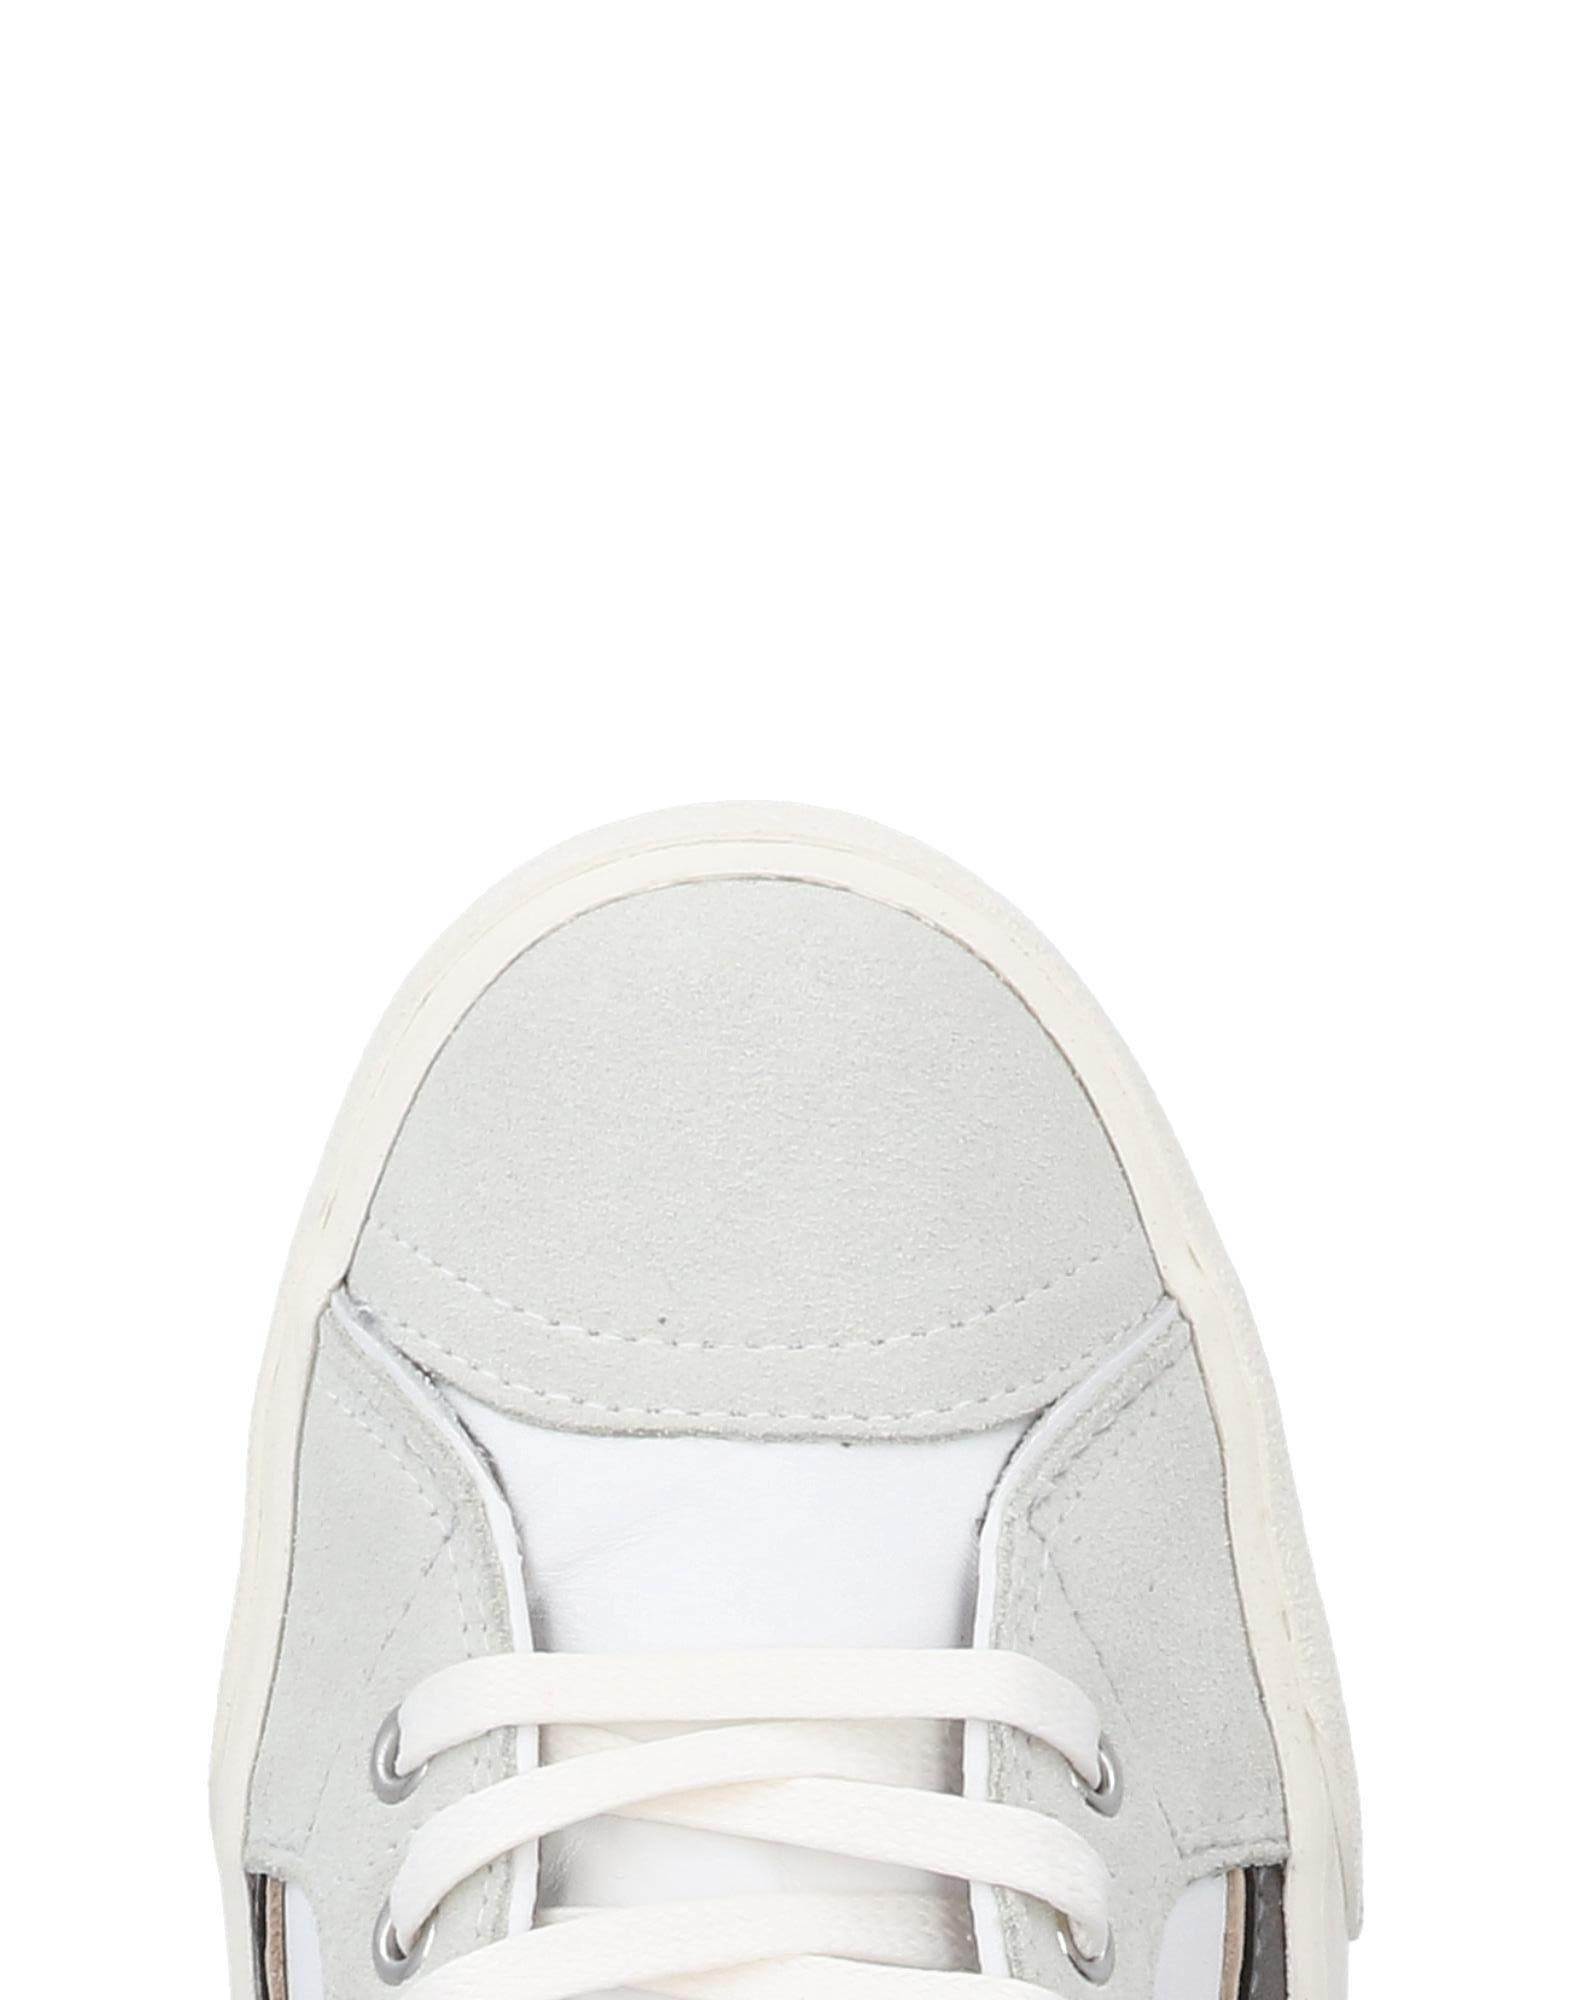 Diesel Sneakers Damen  beliebte 11491227JK Gute Qualität beliebte  Schuhe 29ead1